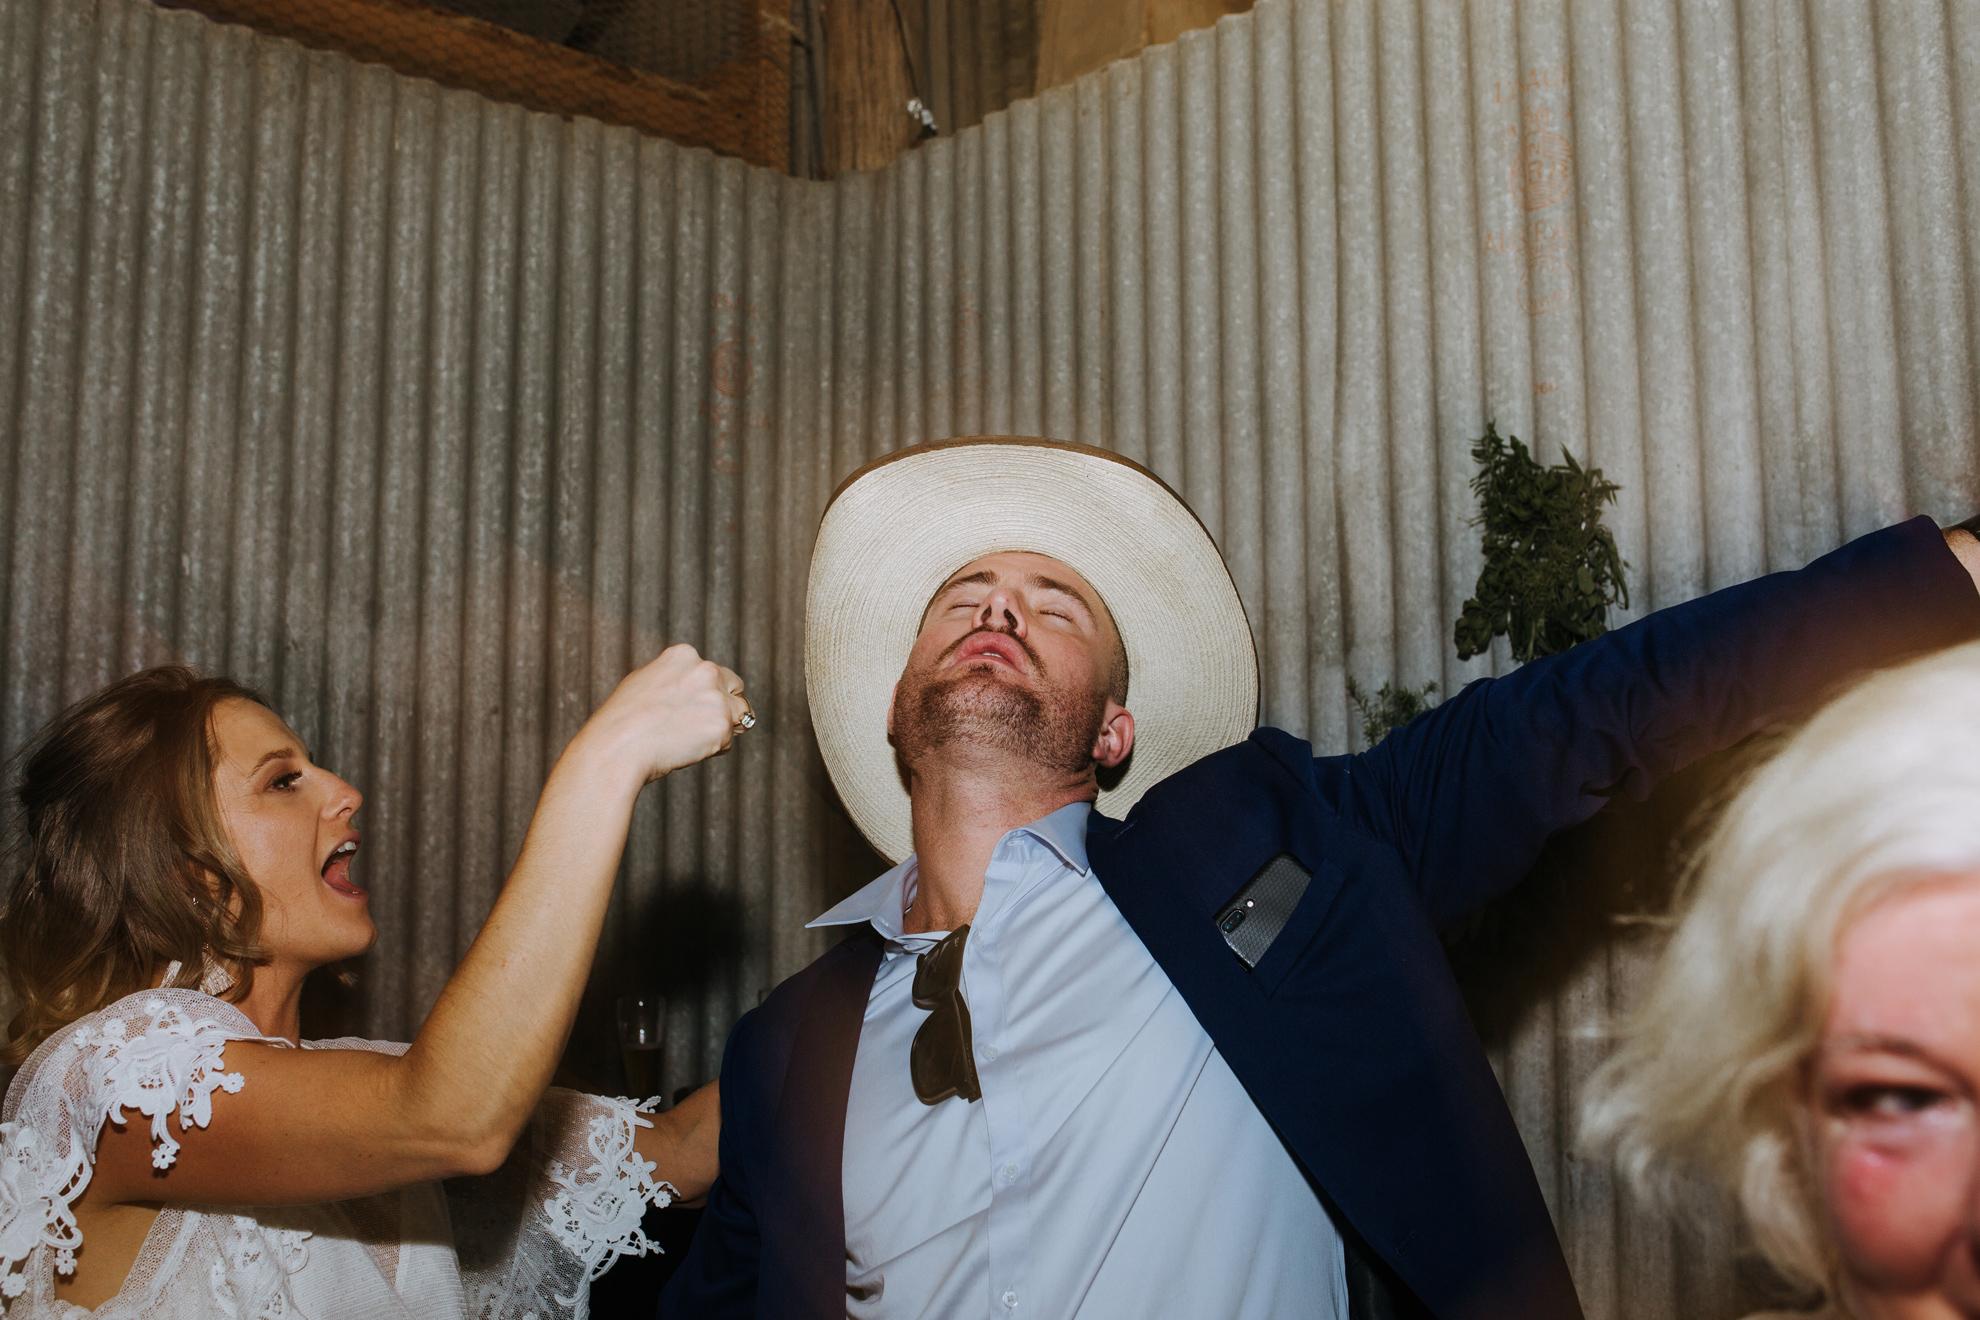 124-Jessie_Jason_Dalby_Country_Wedding.jpg